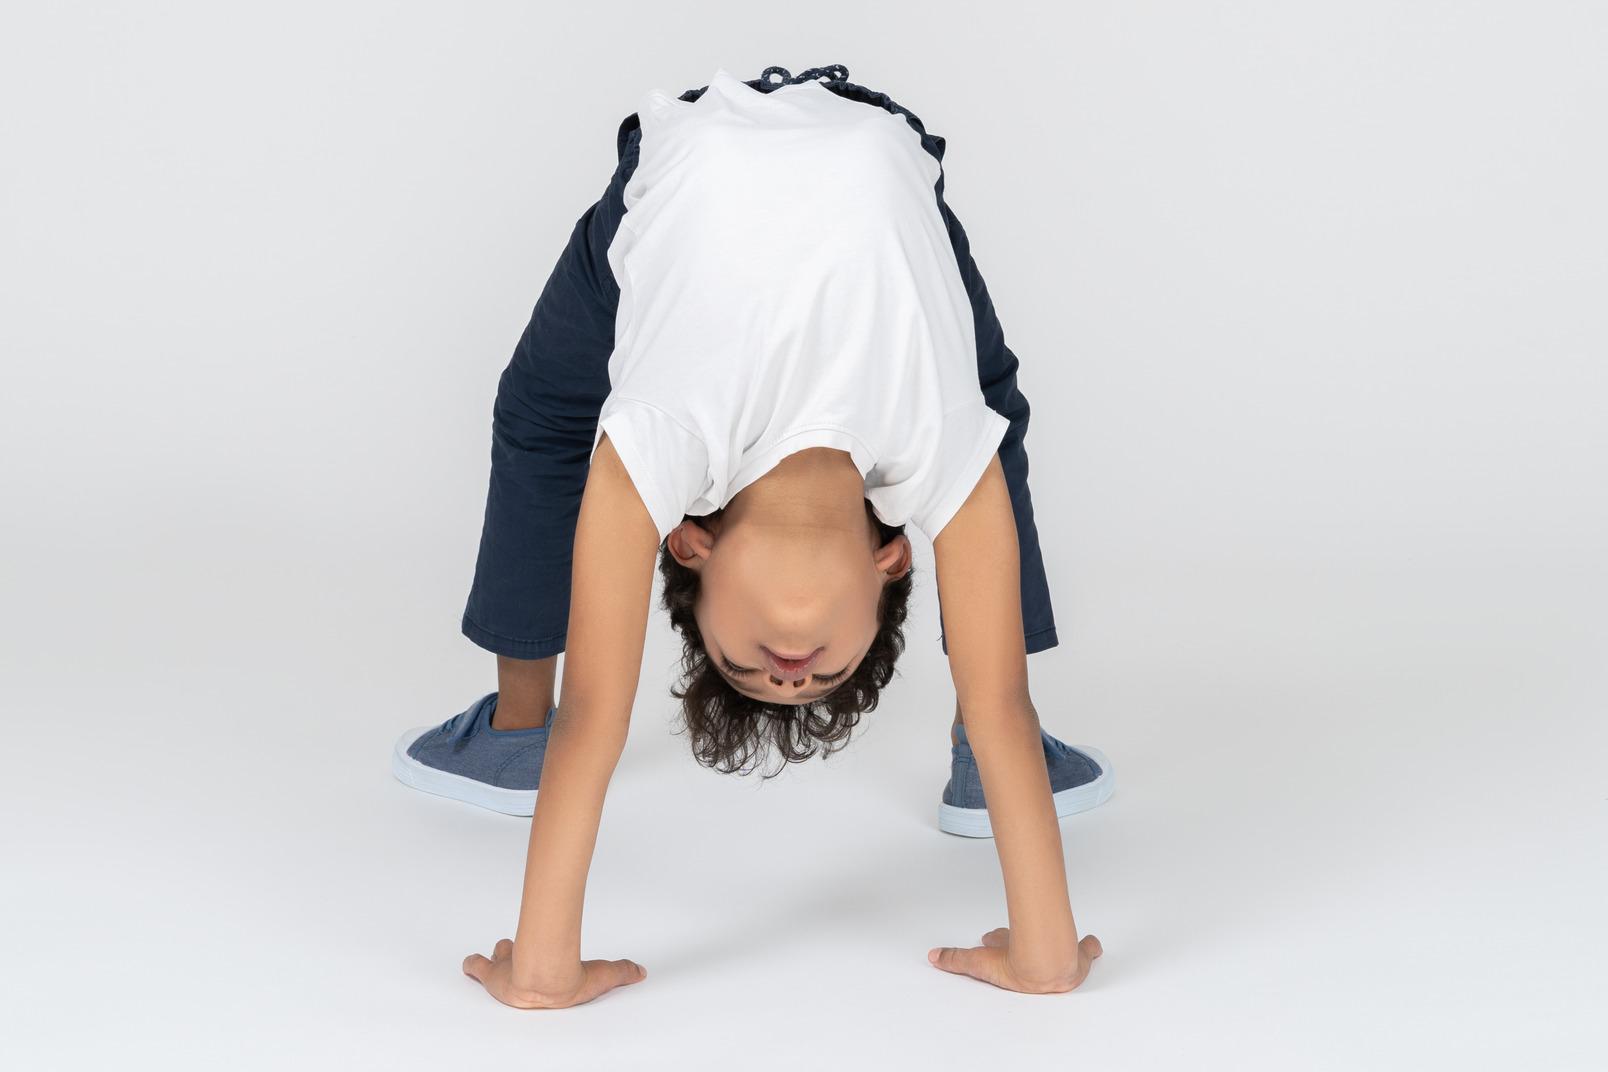 A boy doing bridge exercise